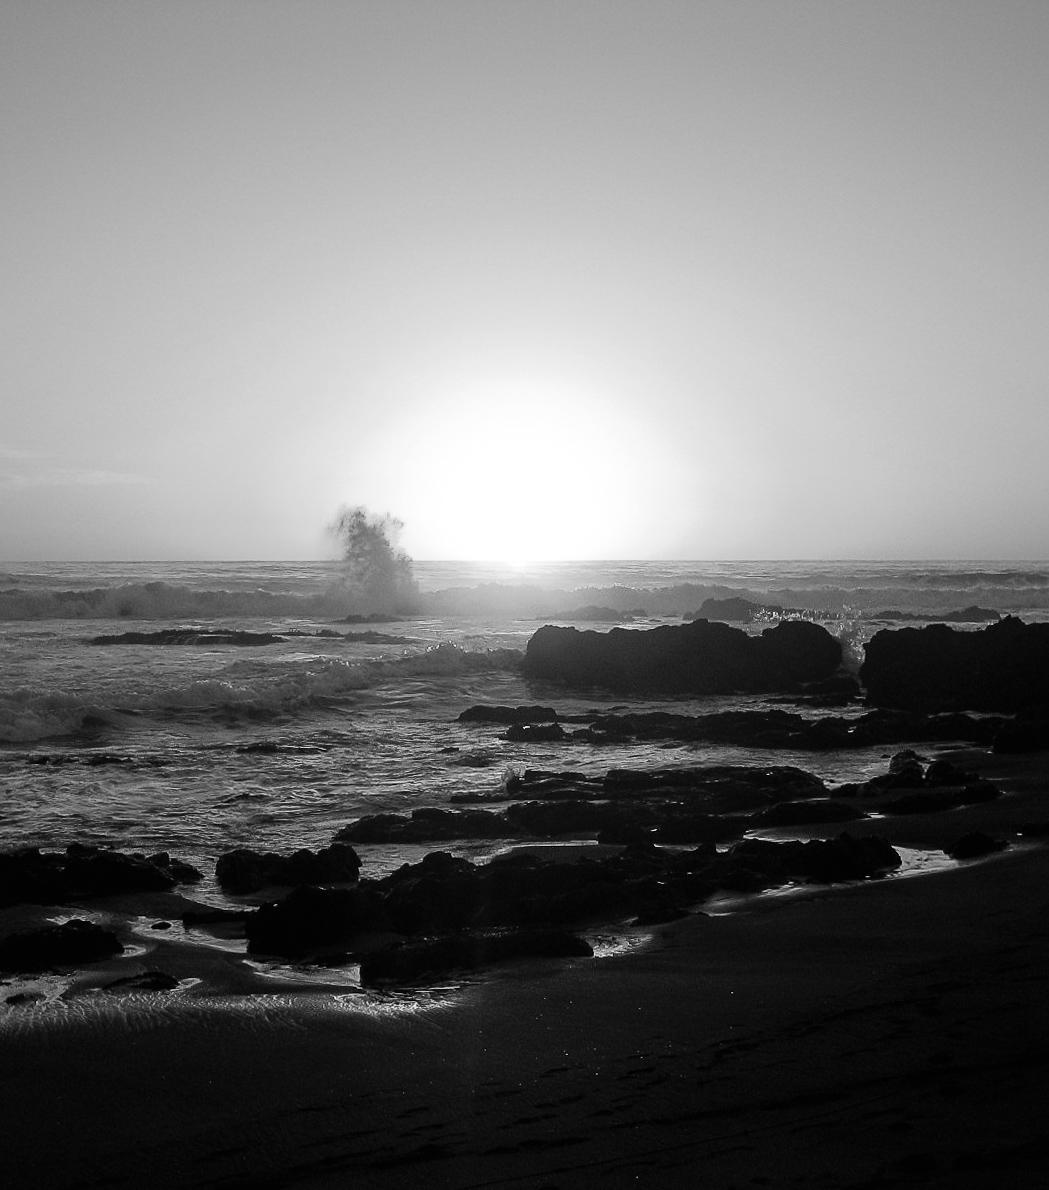 pichilemu-0077-_waves-on-rocks-splash-in-sunlight.jpg